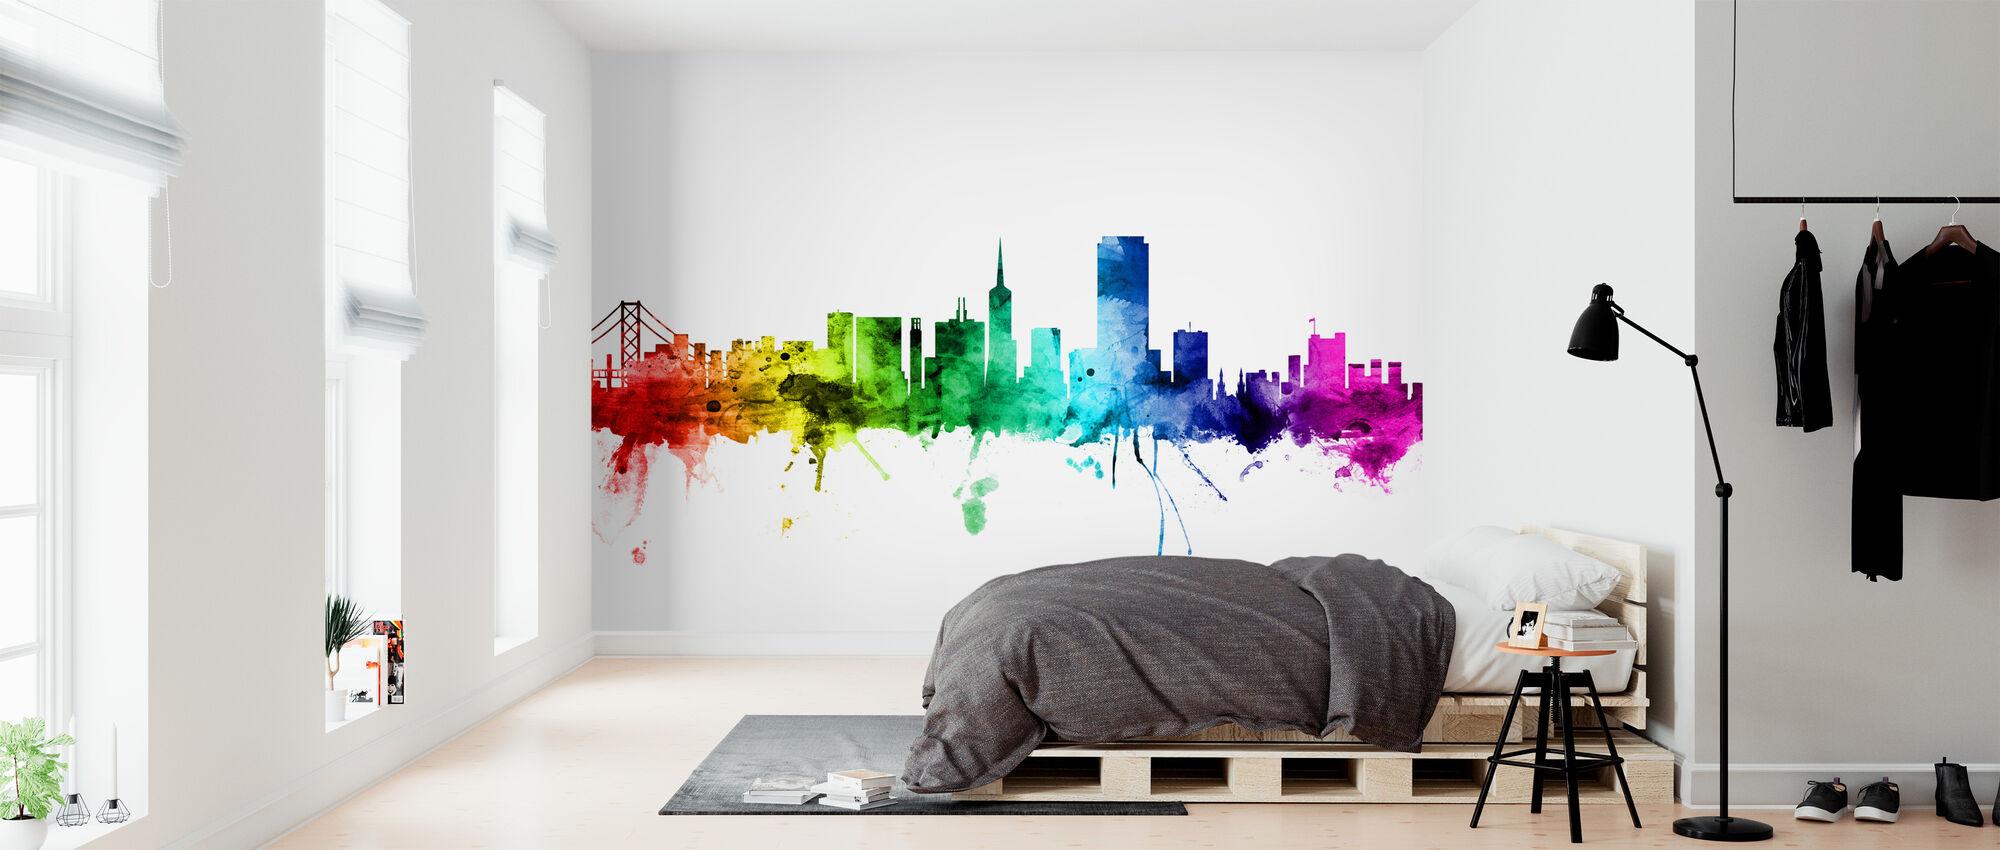 San Francisco Skyline Rainbow - Wallpaper - Bedroom